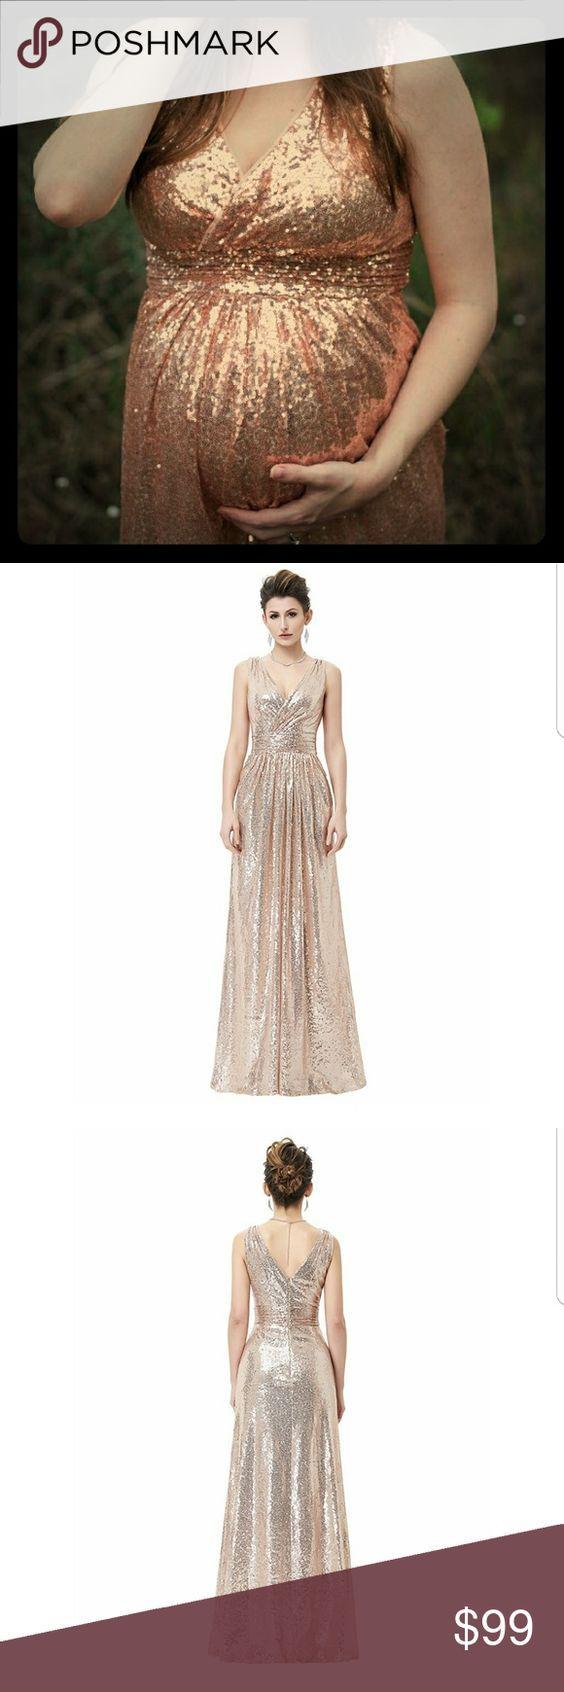 Rose gold blush pink sequin maternity dress boutique pinterest